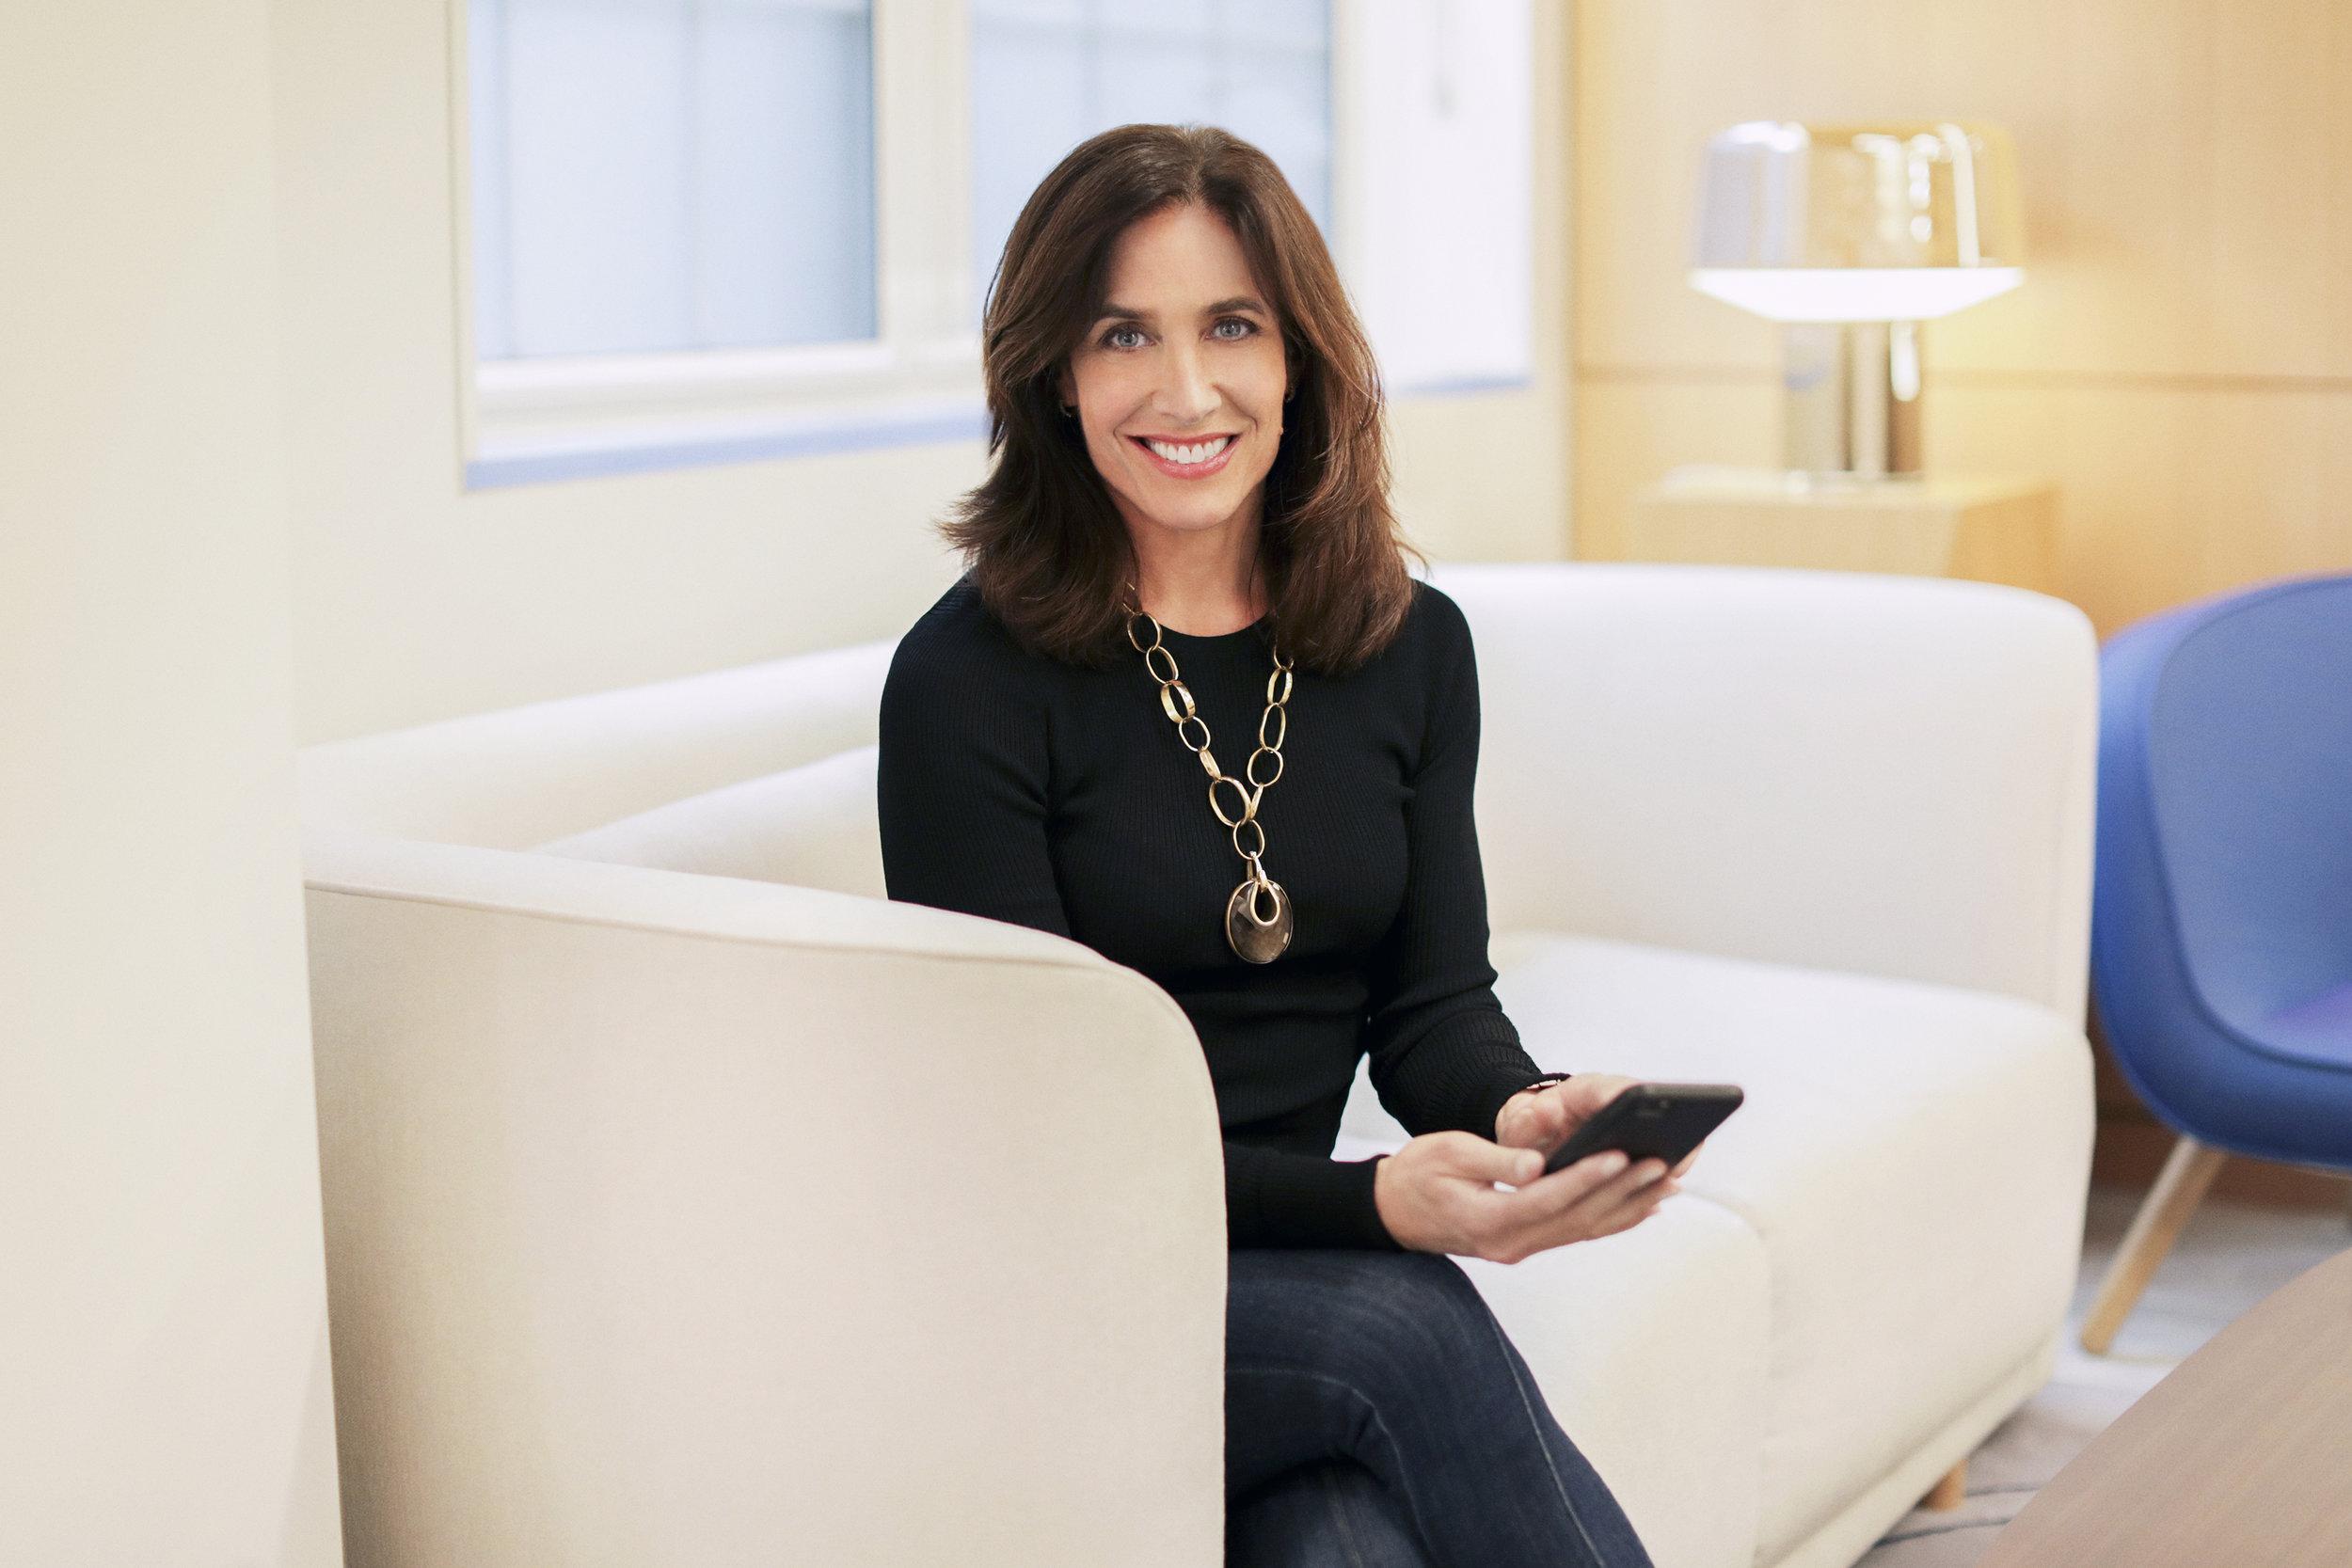 Sitting in black shirt in Amy's office  20181127 - Jonathan Grassi - 0335.jpg